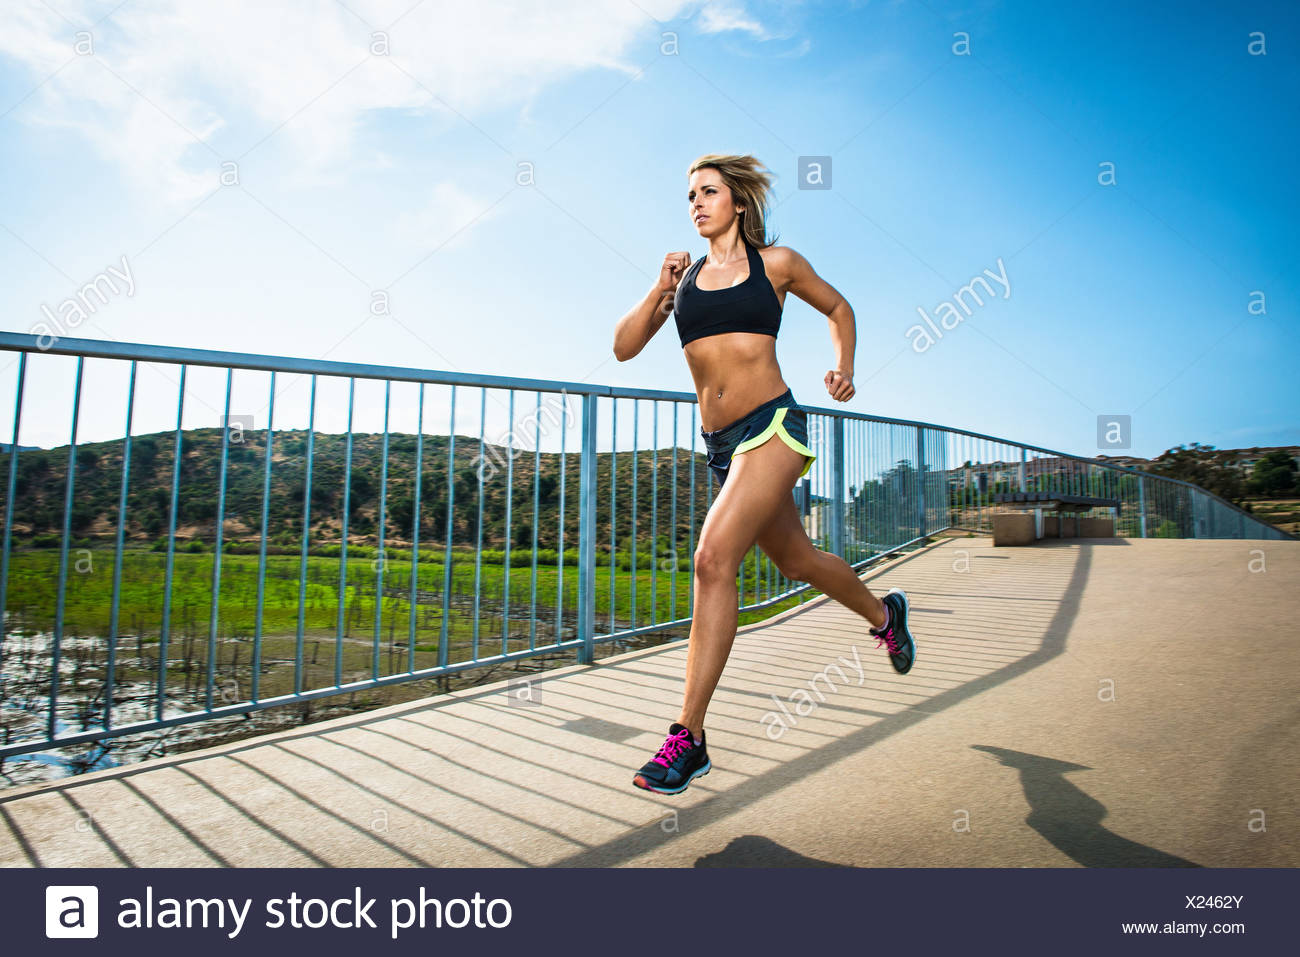 Athletic woman running on bridge - Stock Image